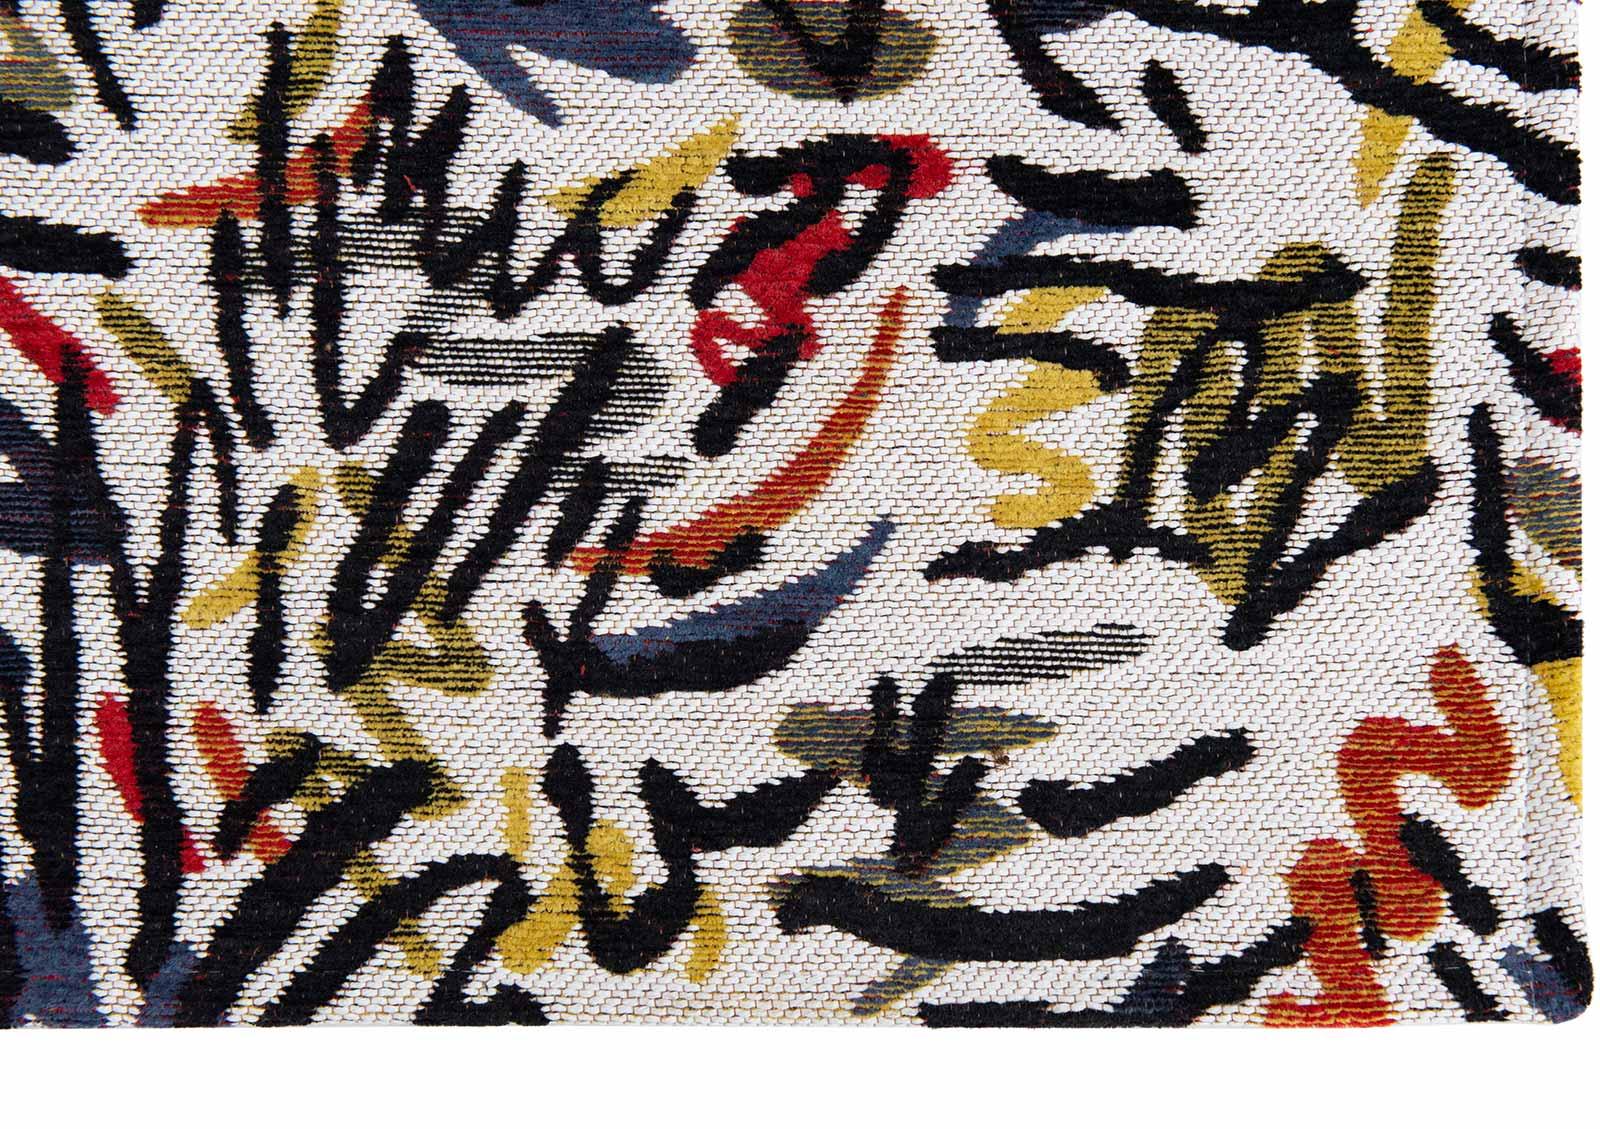 Louis De Poortere rug CS 9144 Gallery Graffito Street Graph corner